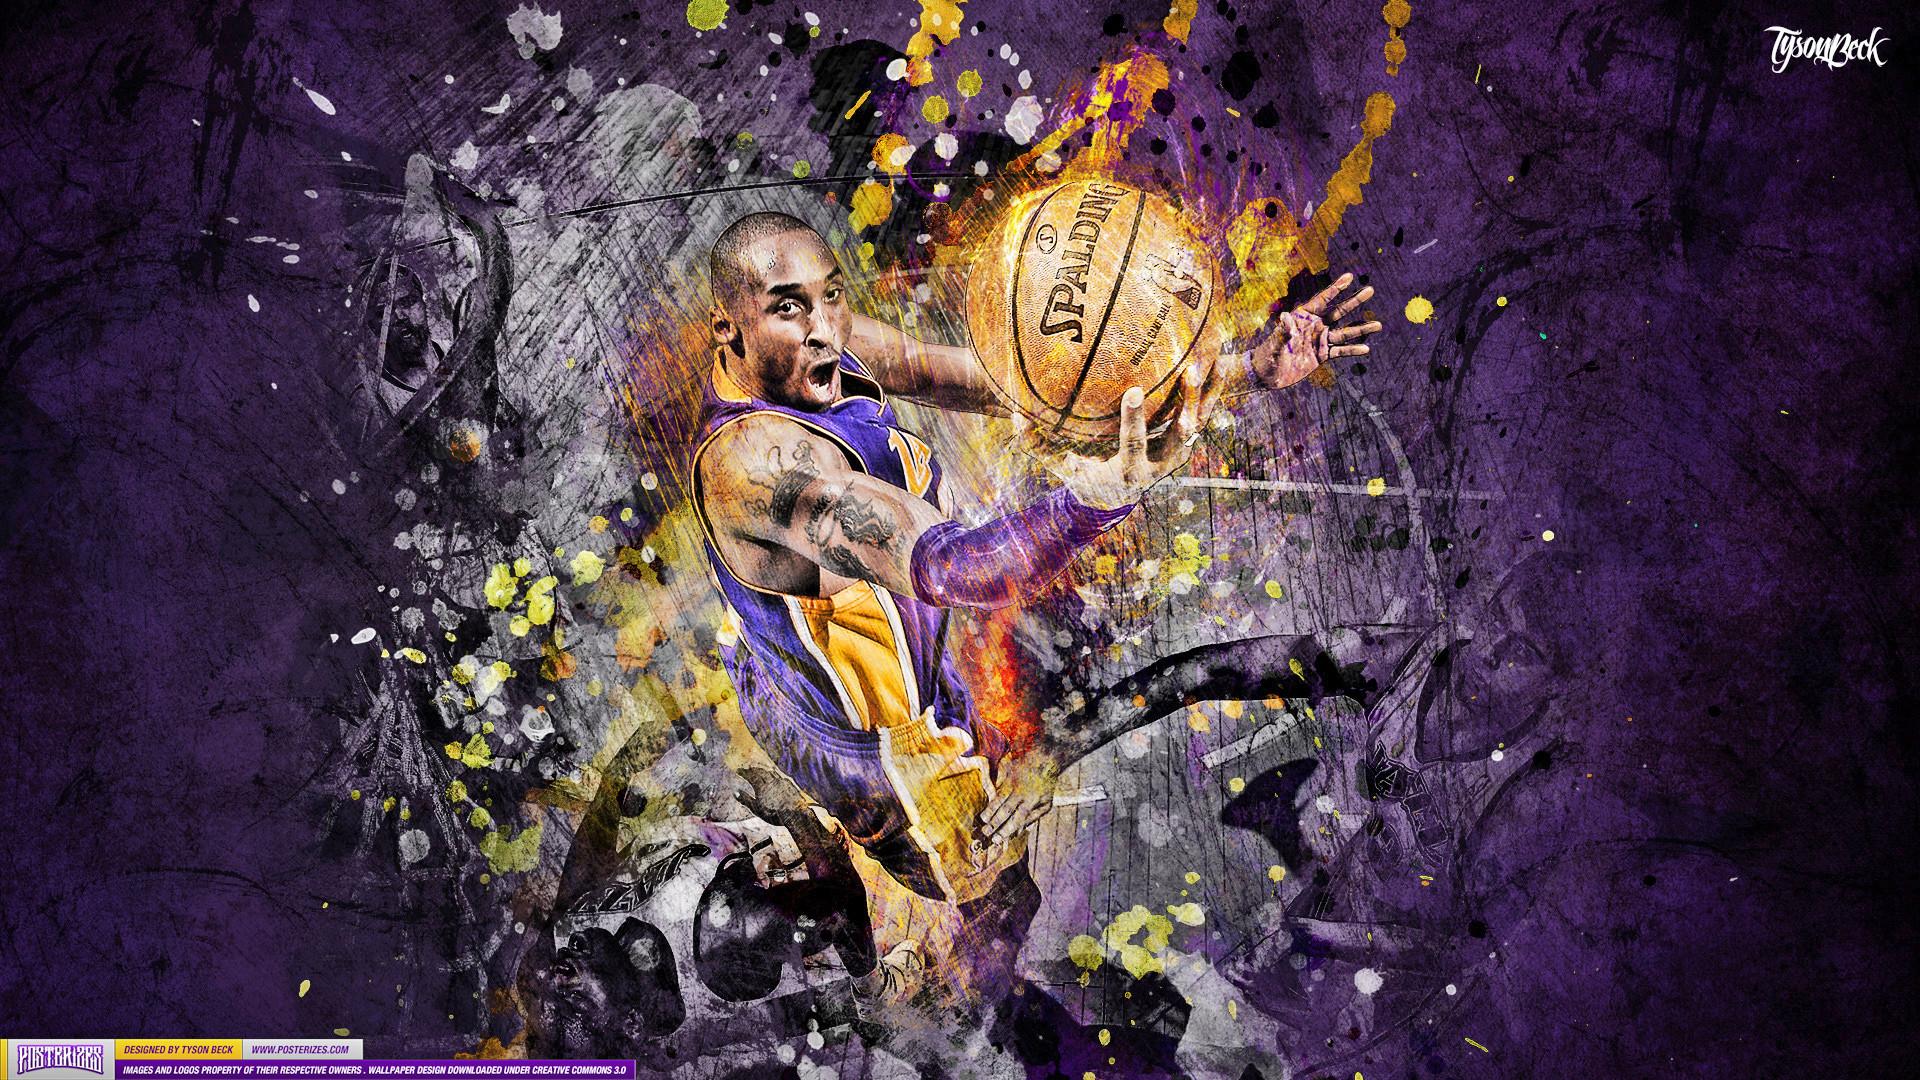 Kobe Bryant Iphone 5 wallpaper 244947